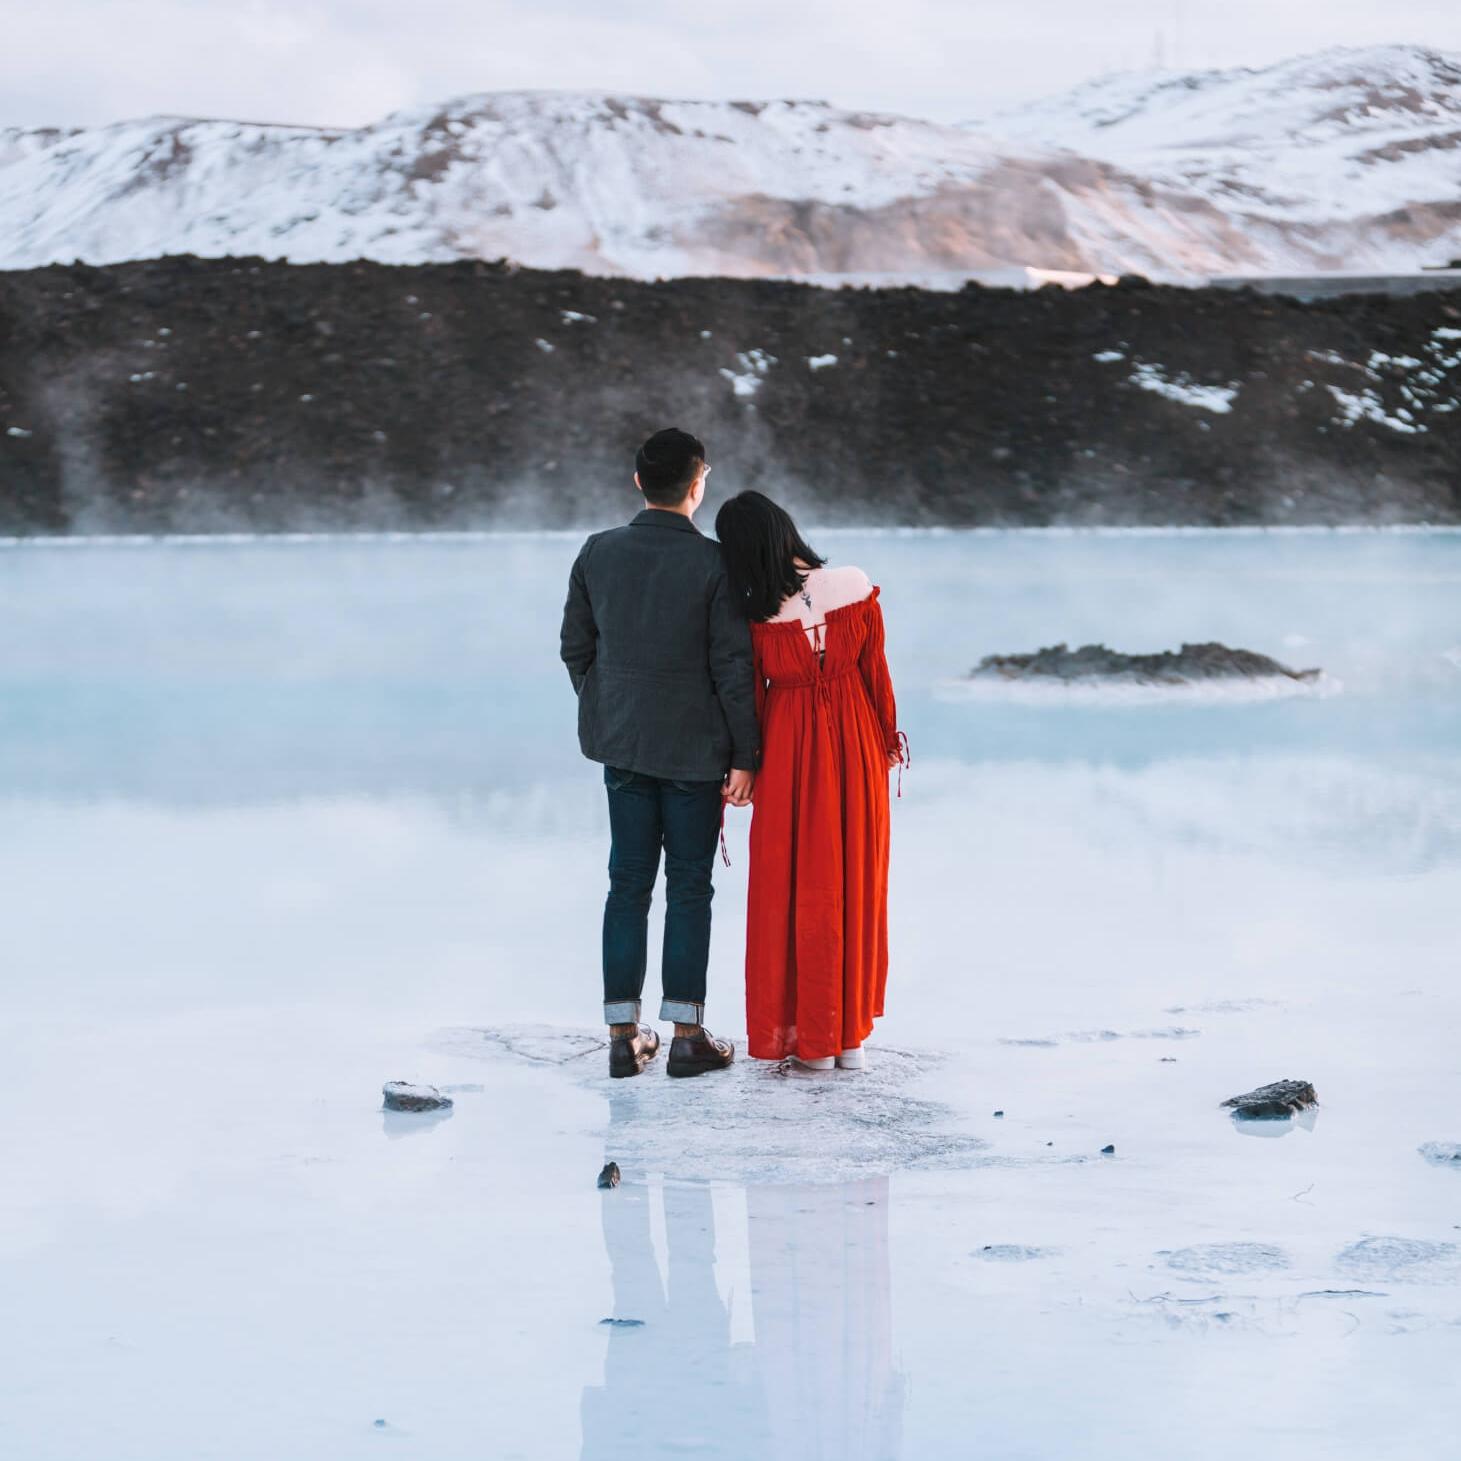 PHOTOSHOOT COURSEChoose 2 preferred places from the following locations:- Kleifarvatn- Gunnuhver-Grindavik-Miðlína-Blue Lagoon - Photo Location: Blue Lagoon